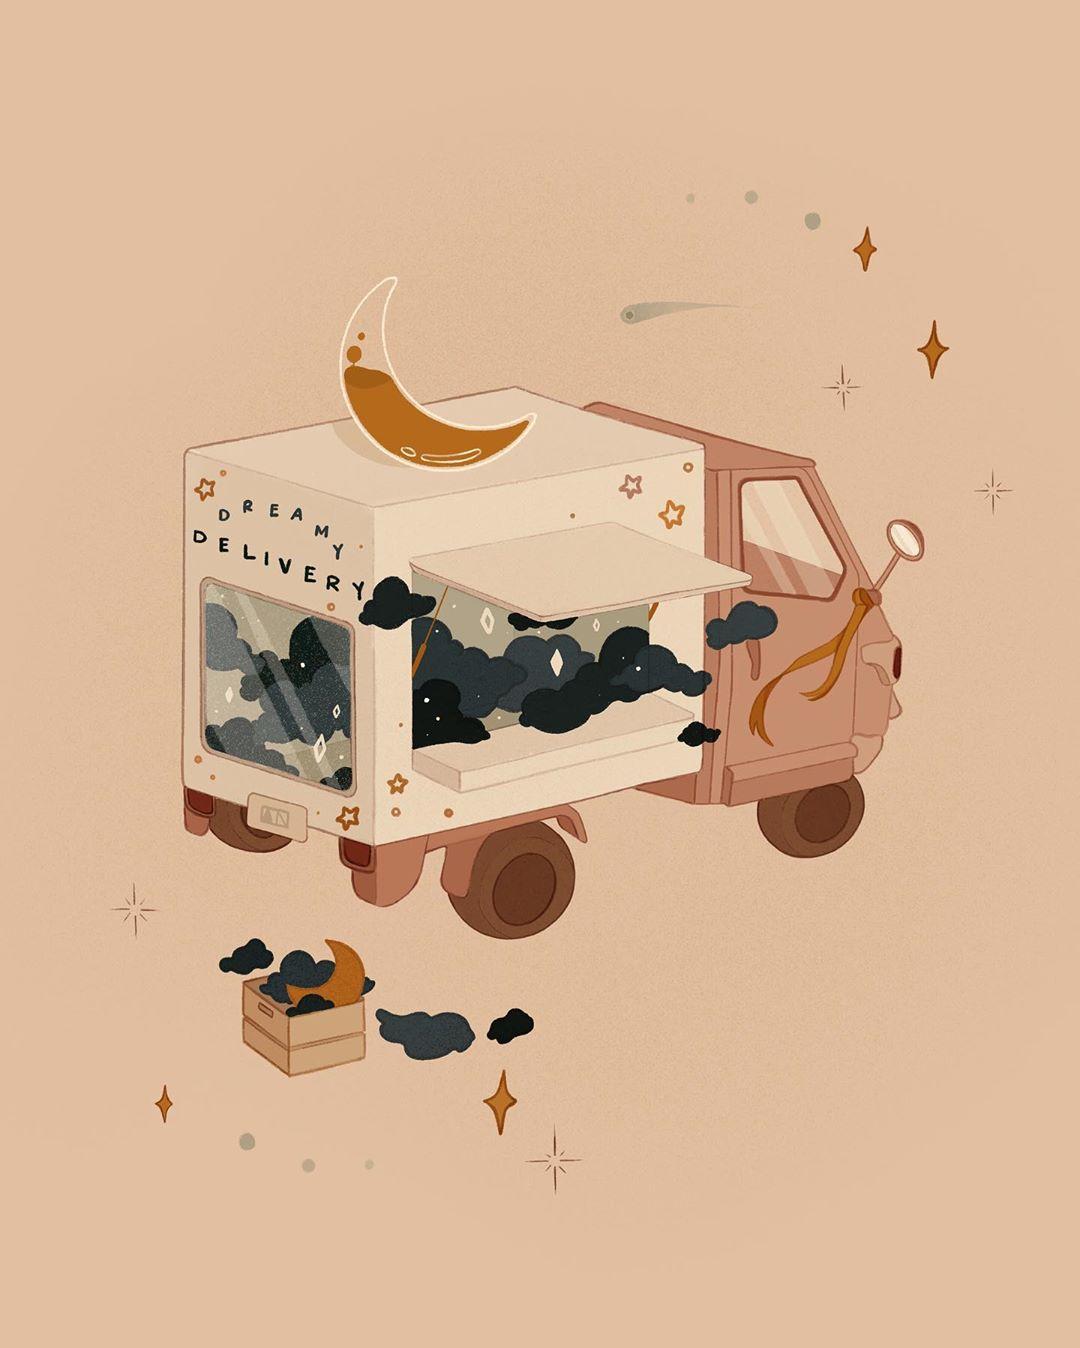 Dreamlike illustration by Angie Nguyen